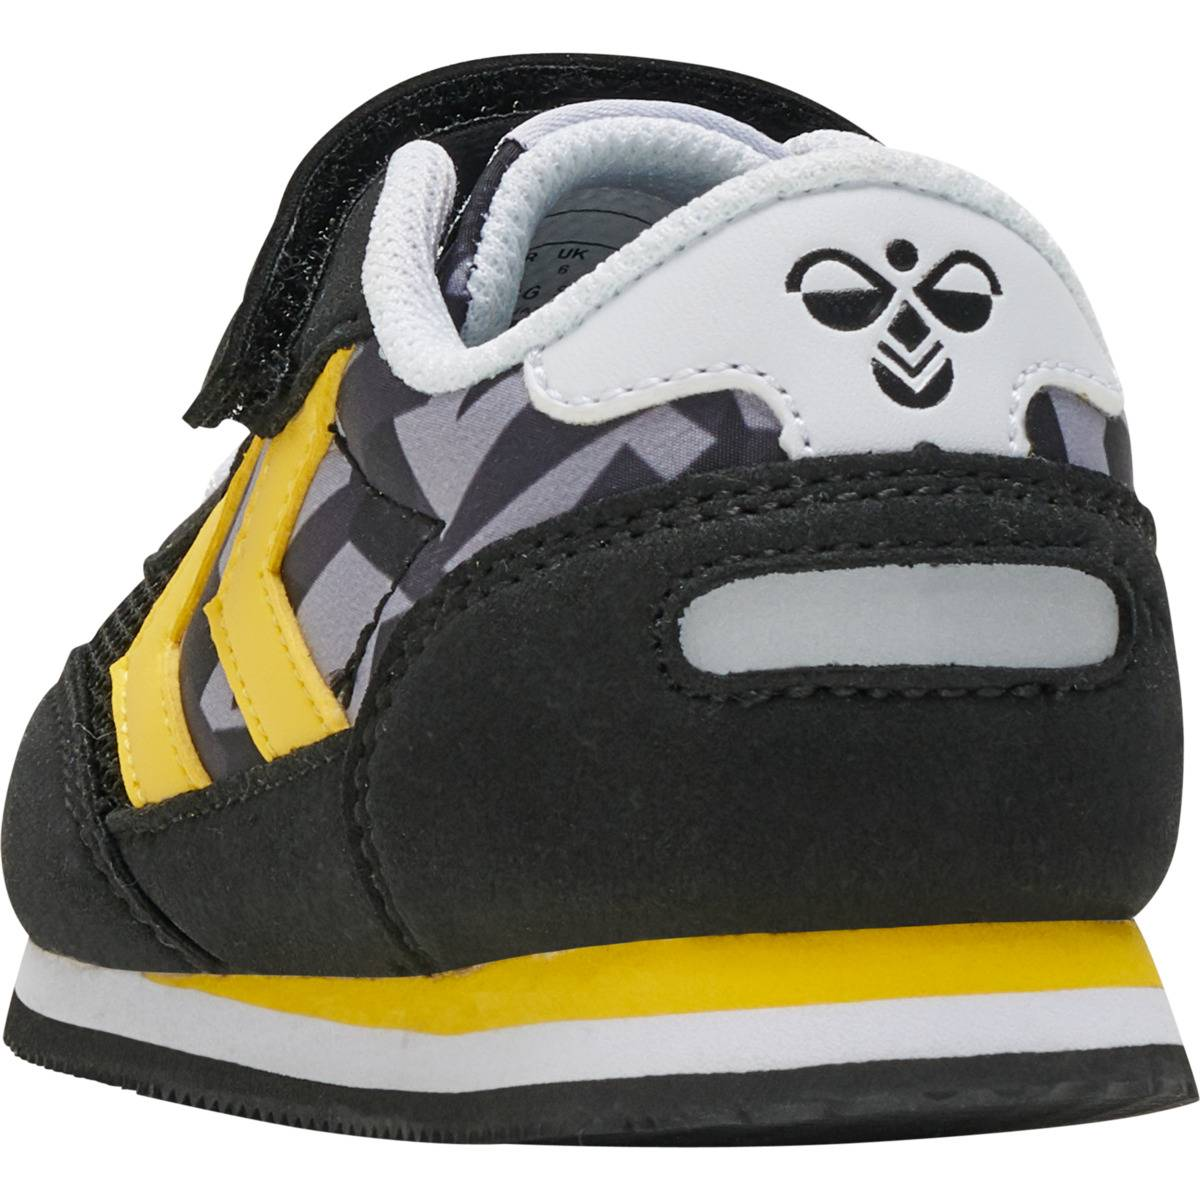 Hummel Reflex infant - black